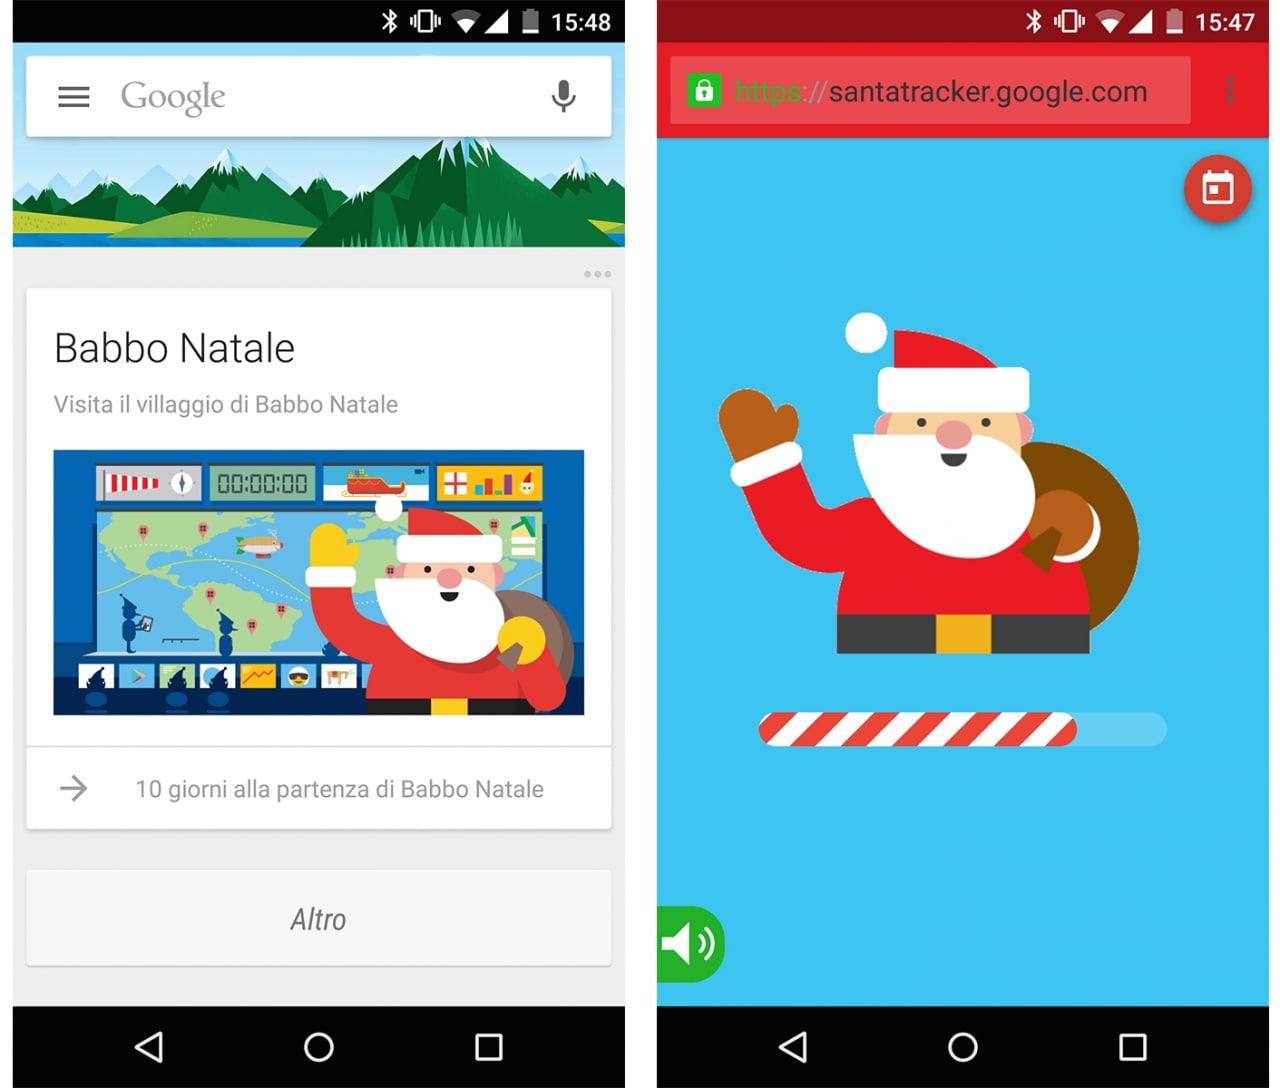 Babbo Natale Google Now